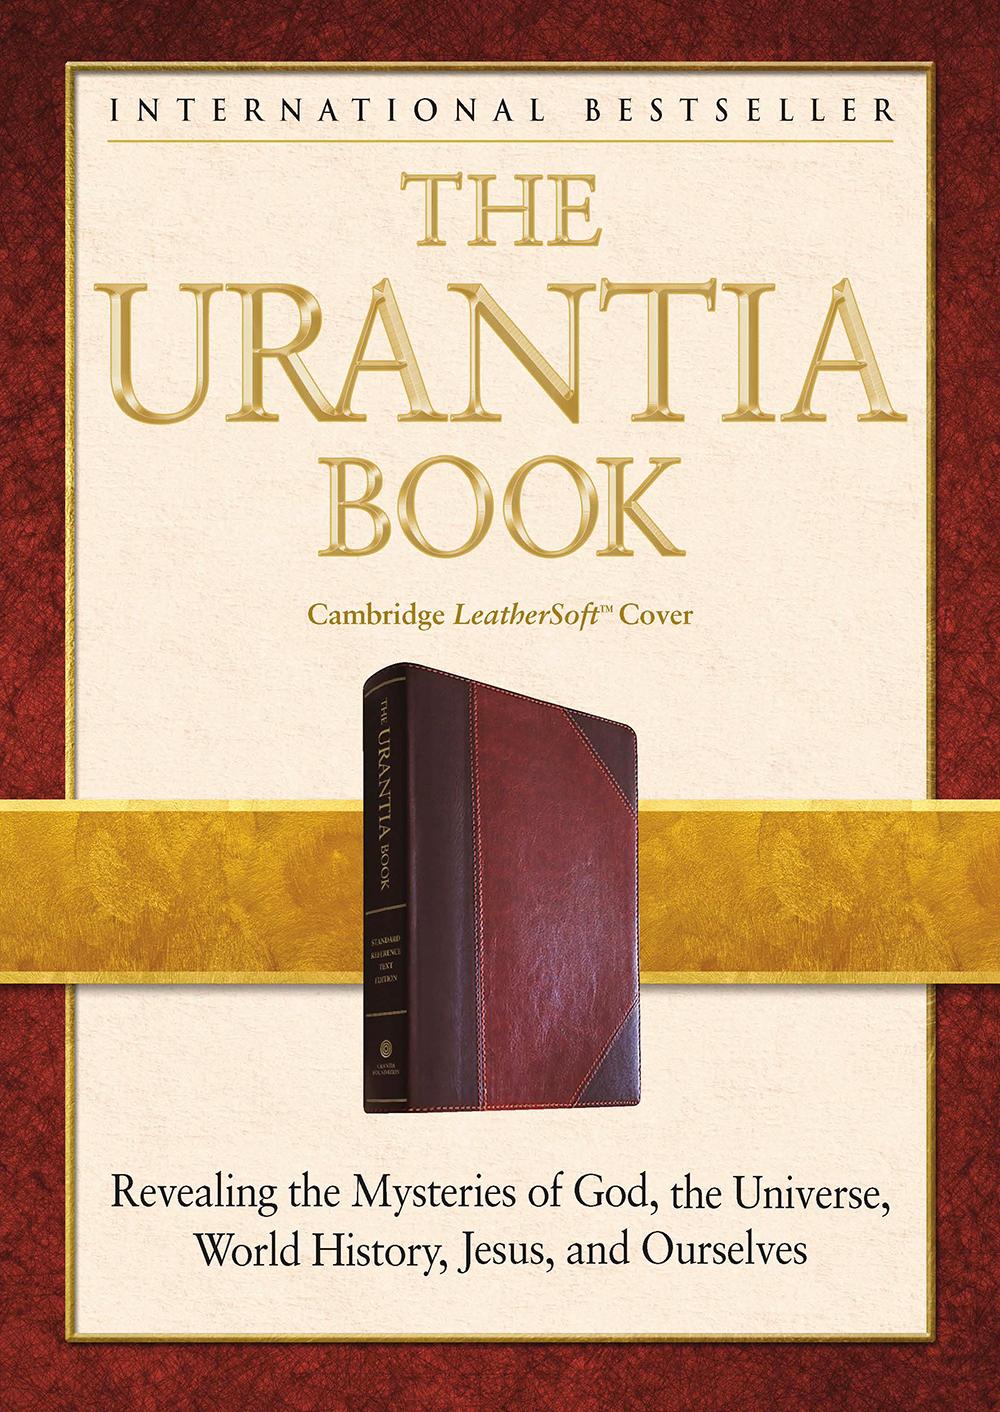 2017 The Urantia Book - Slipcase - Cambridge Leathersoft